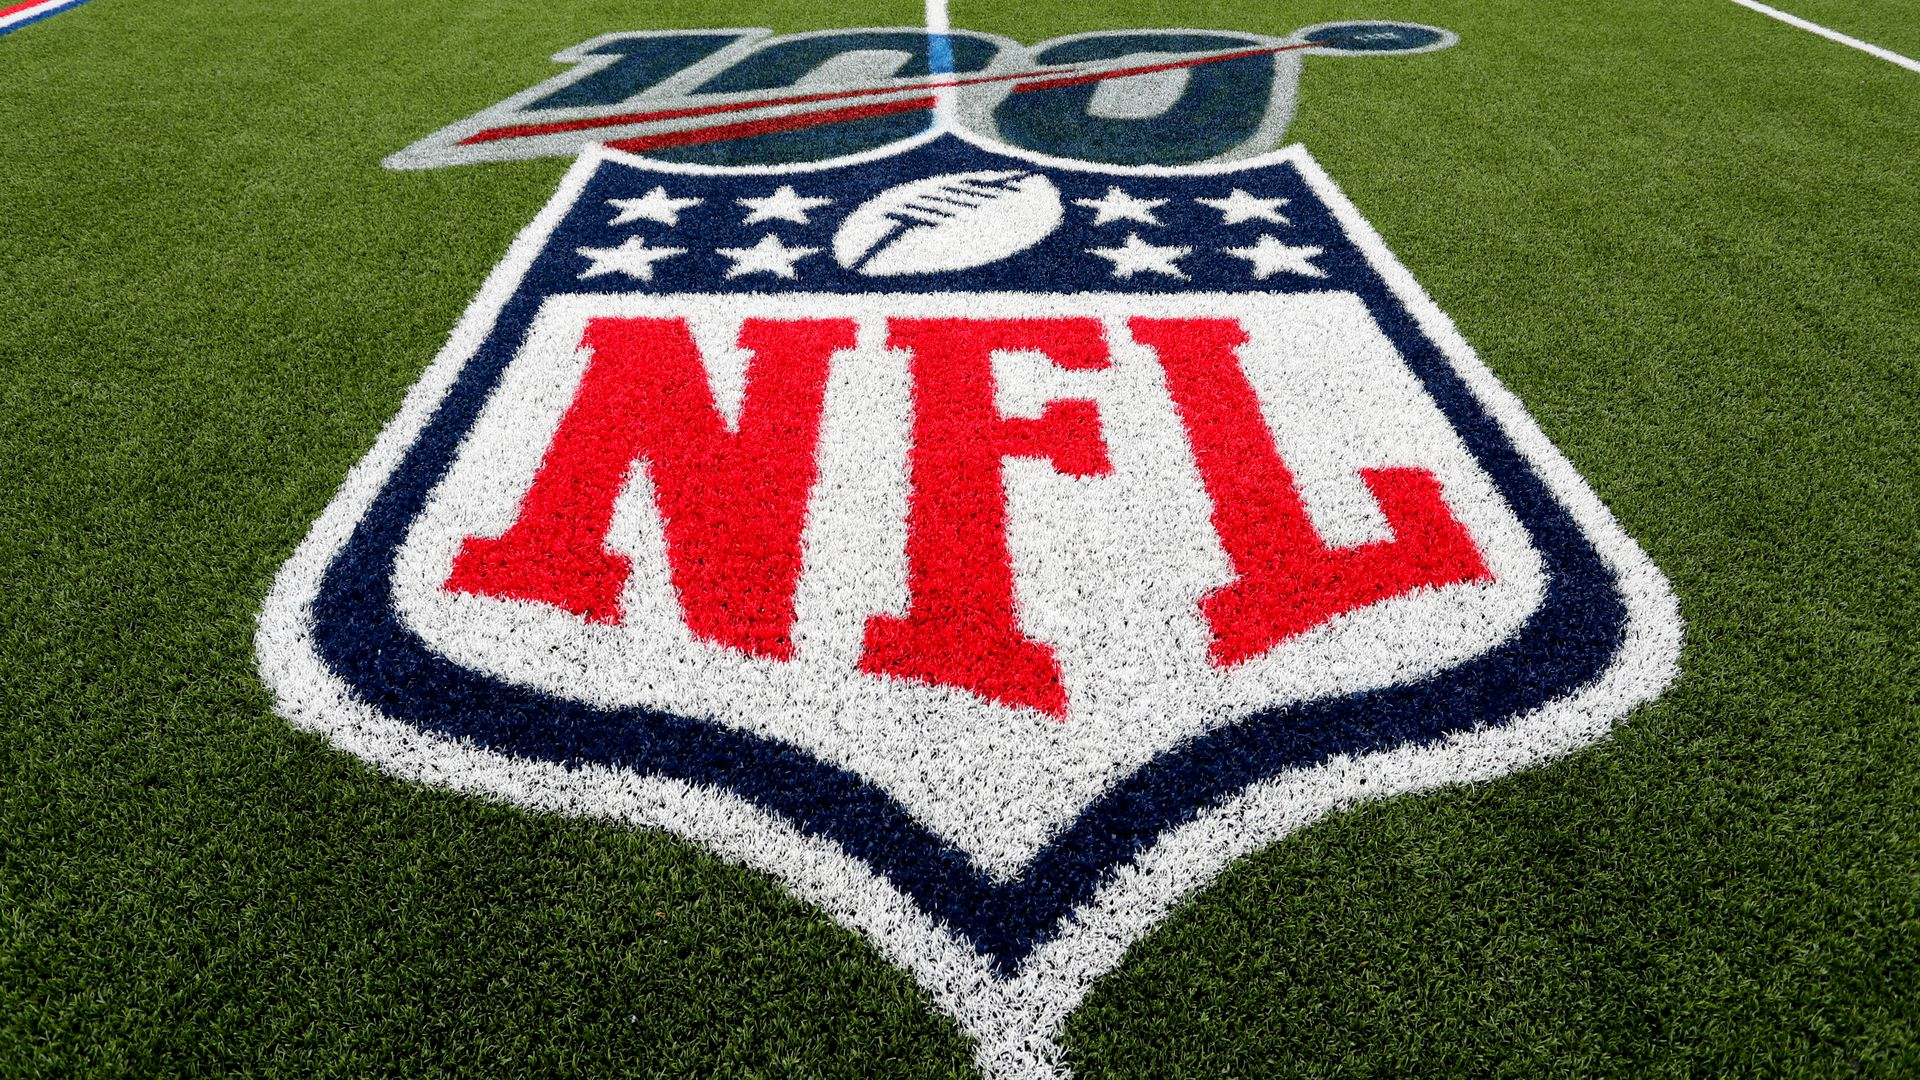 The NFL logo